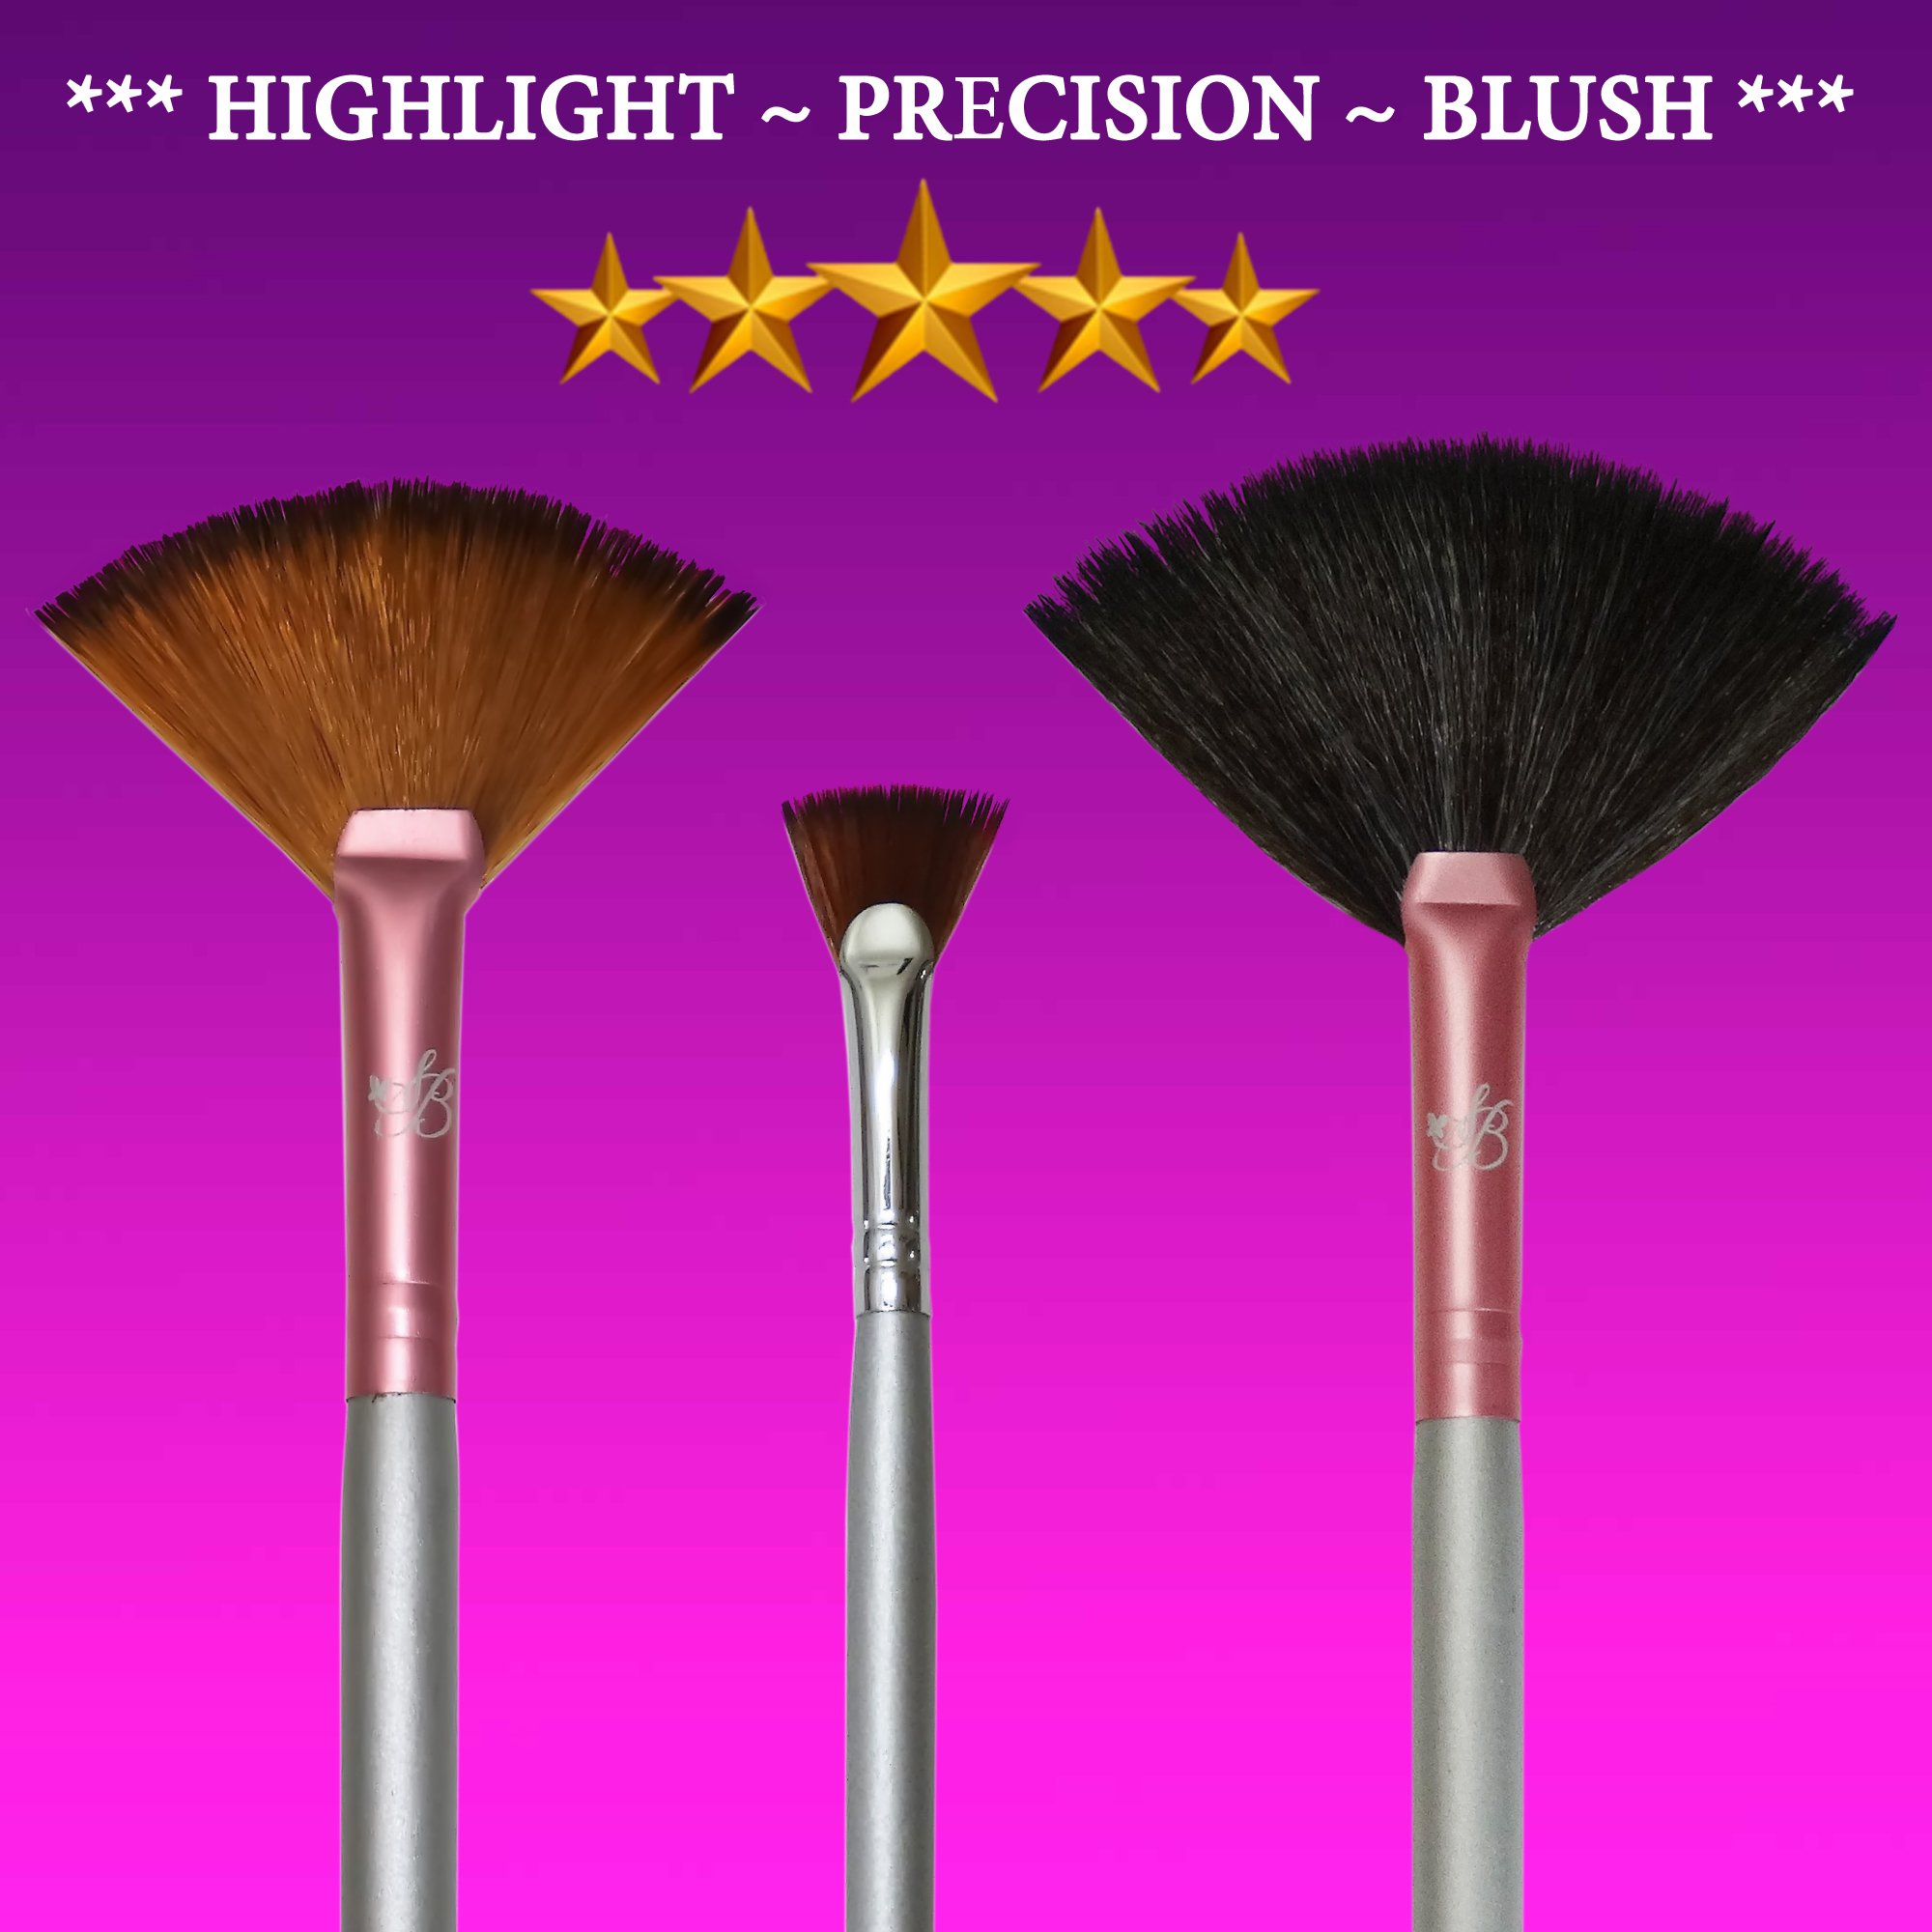 57e7aa90b2e Get Quotations · Fan Brush Set for Highlighter & Highlighting Kit Star  Beauty Premium Fan Brush Makeup Plush Fan